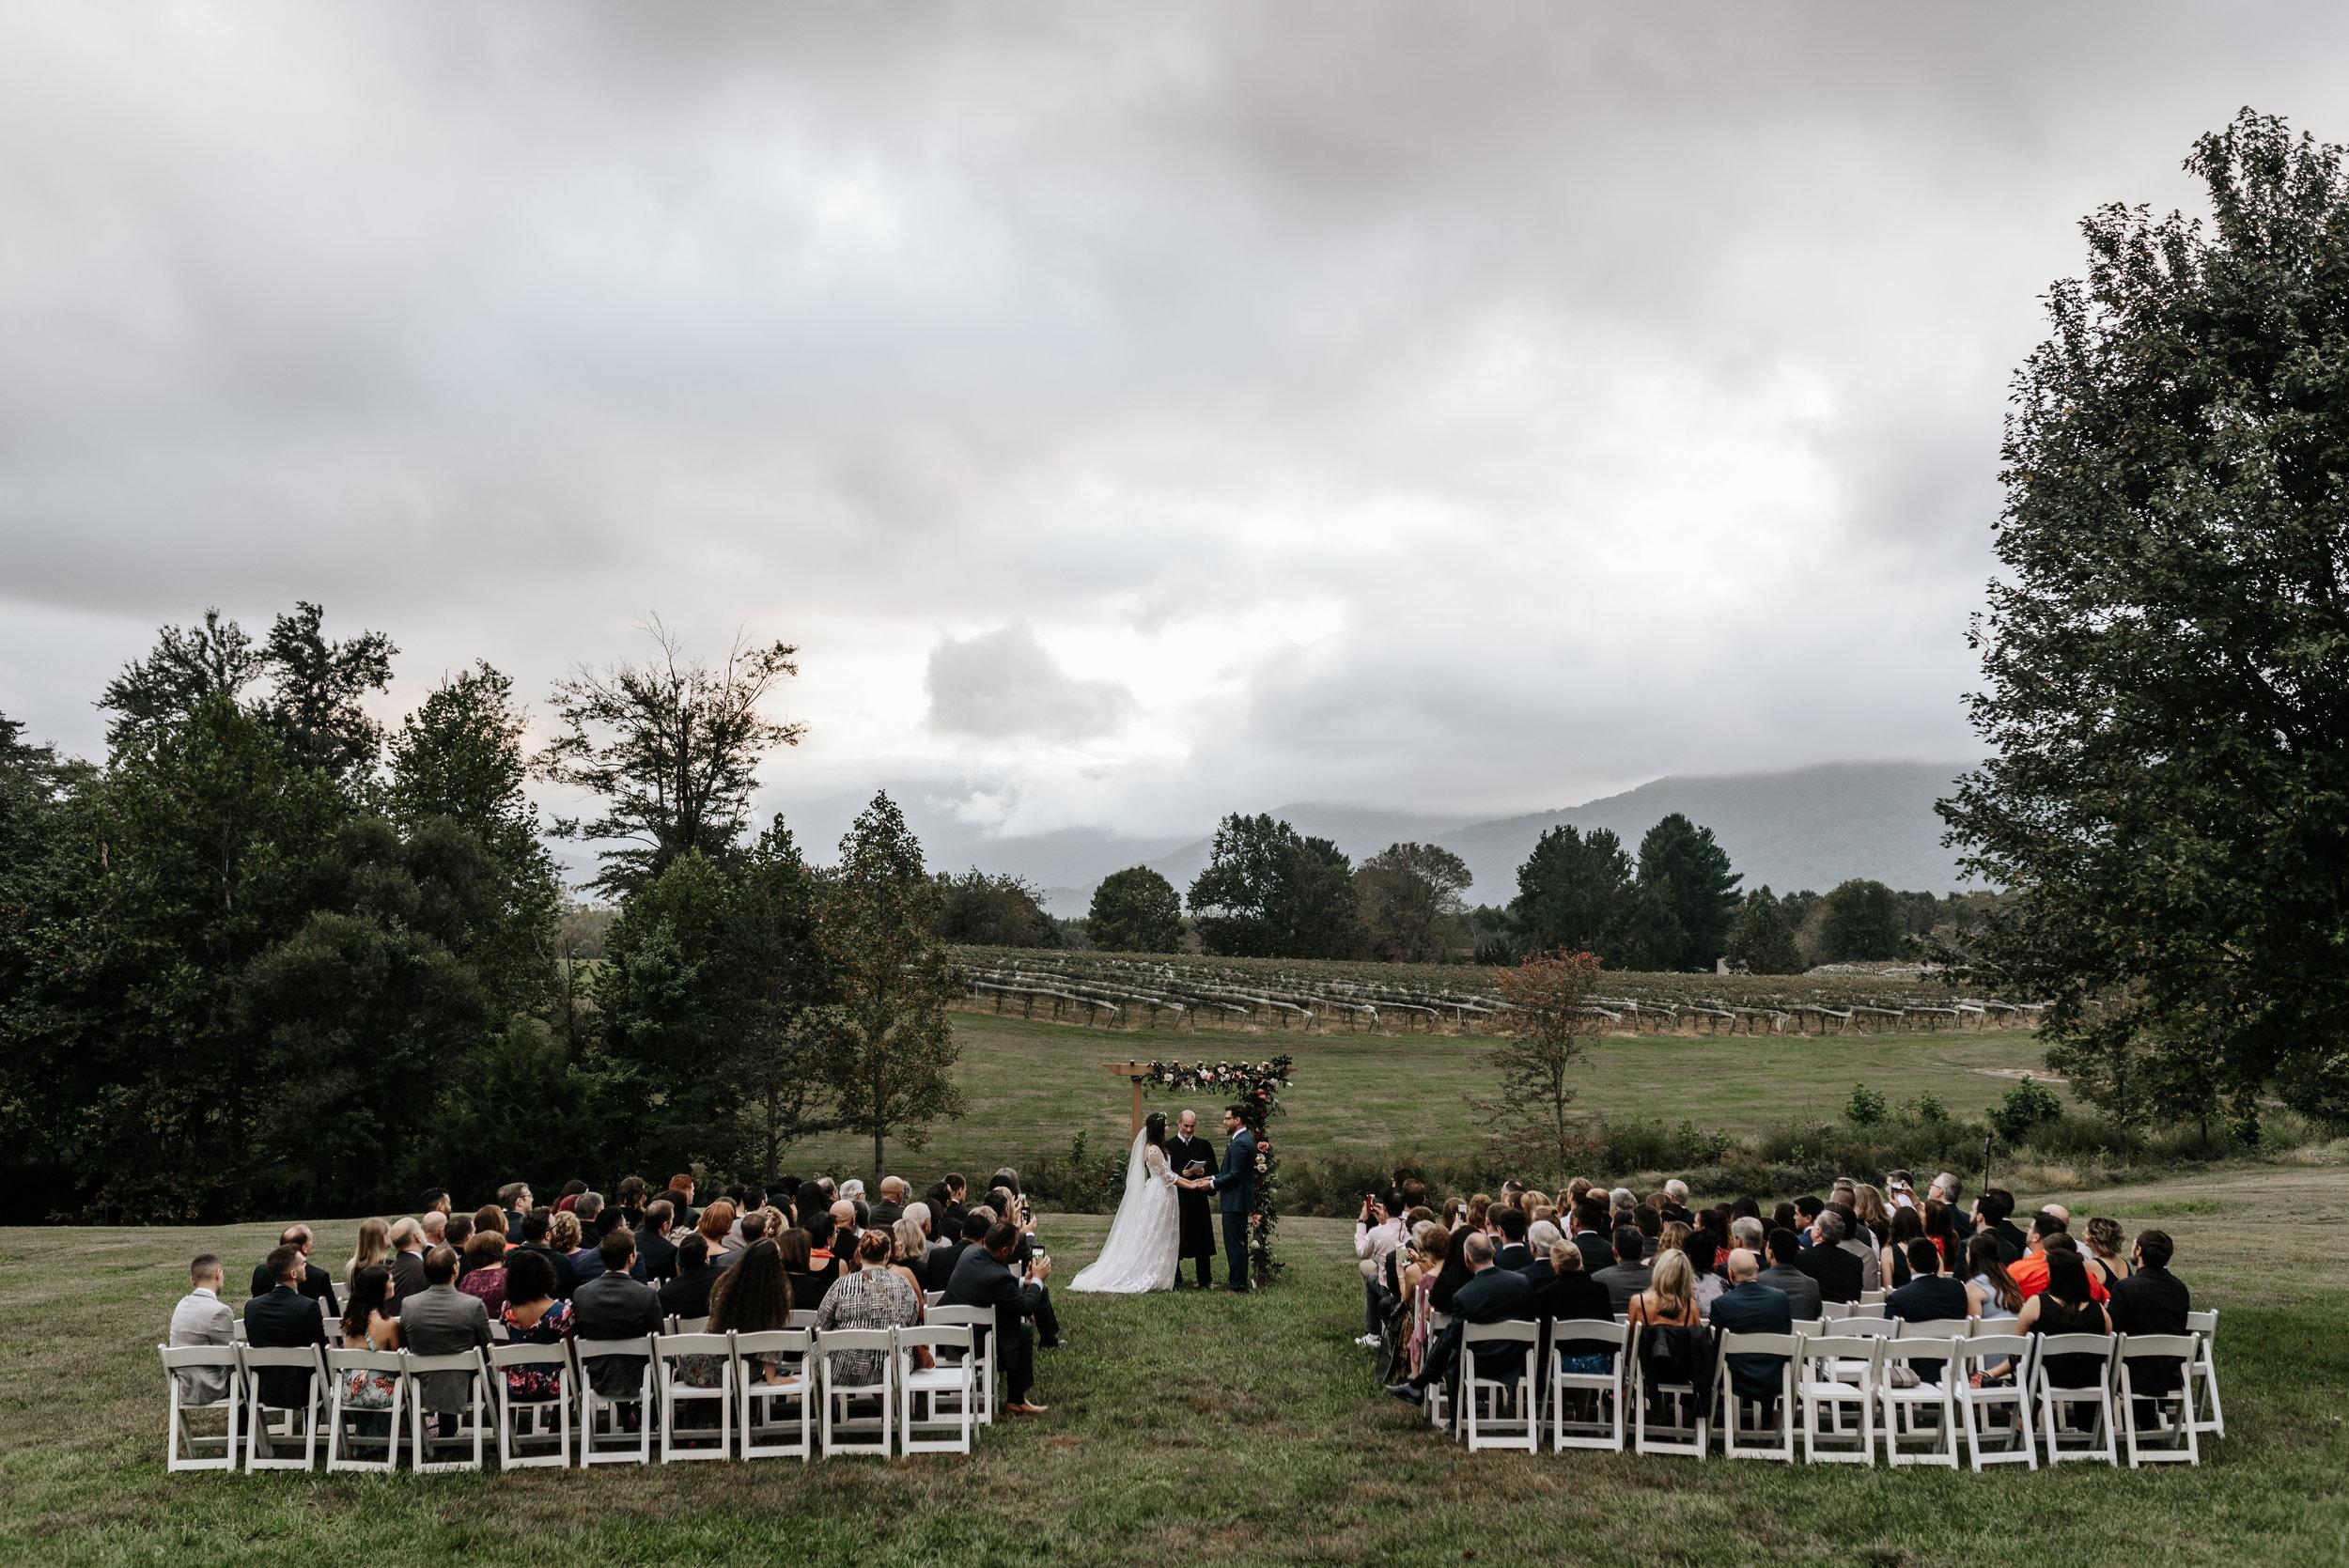 Veritas-Vineyards-and-Winery-Wedding-Photography-Afton-Virginia-Yasmin-Seth-Photography-by-V-9647.jpg